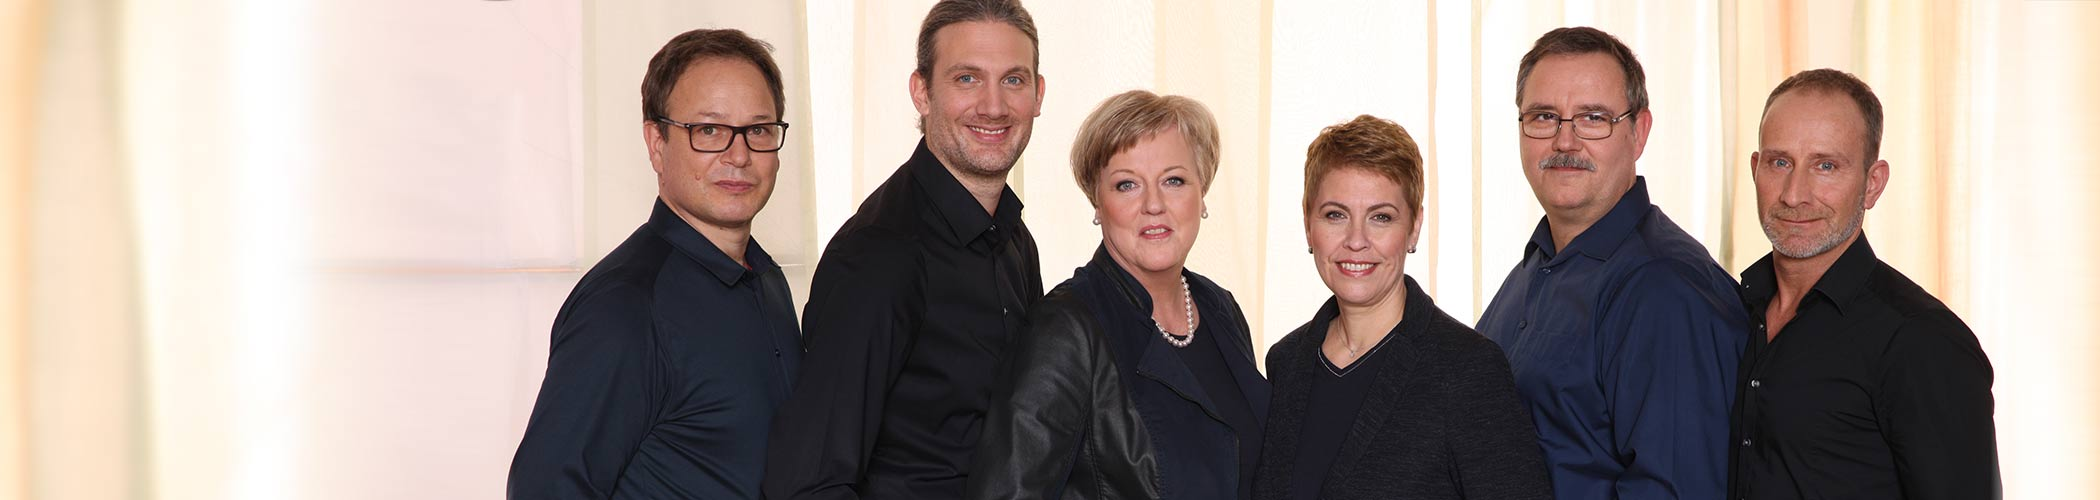 team-seniorenstift-Ludwigsburg-1